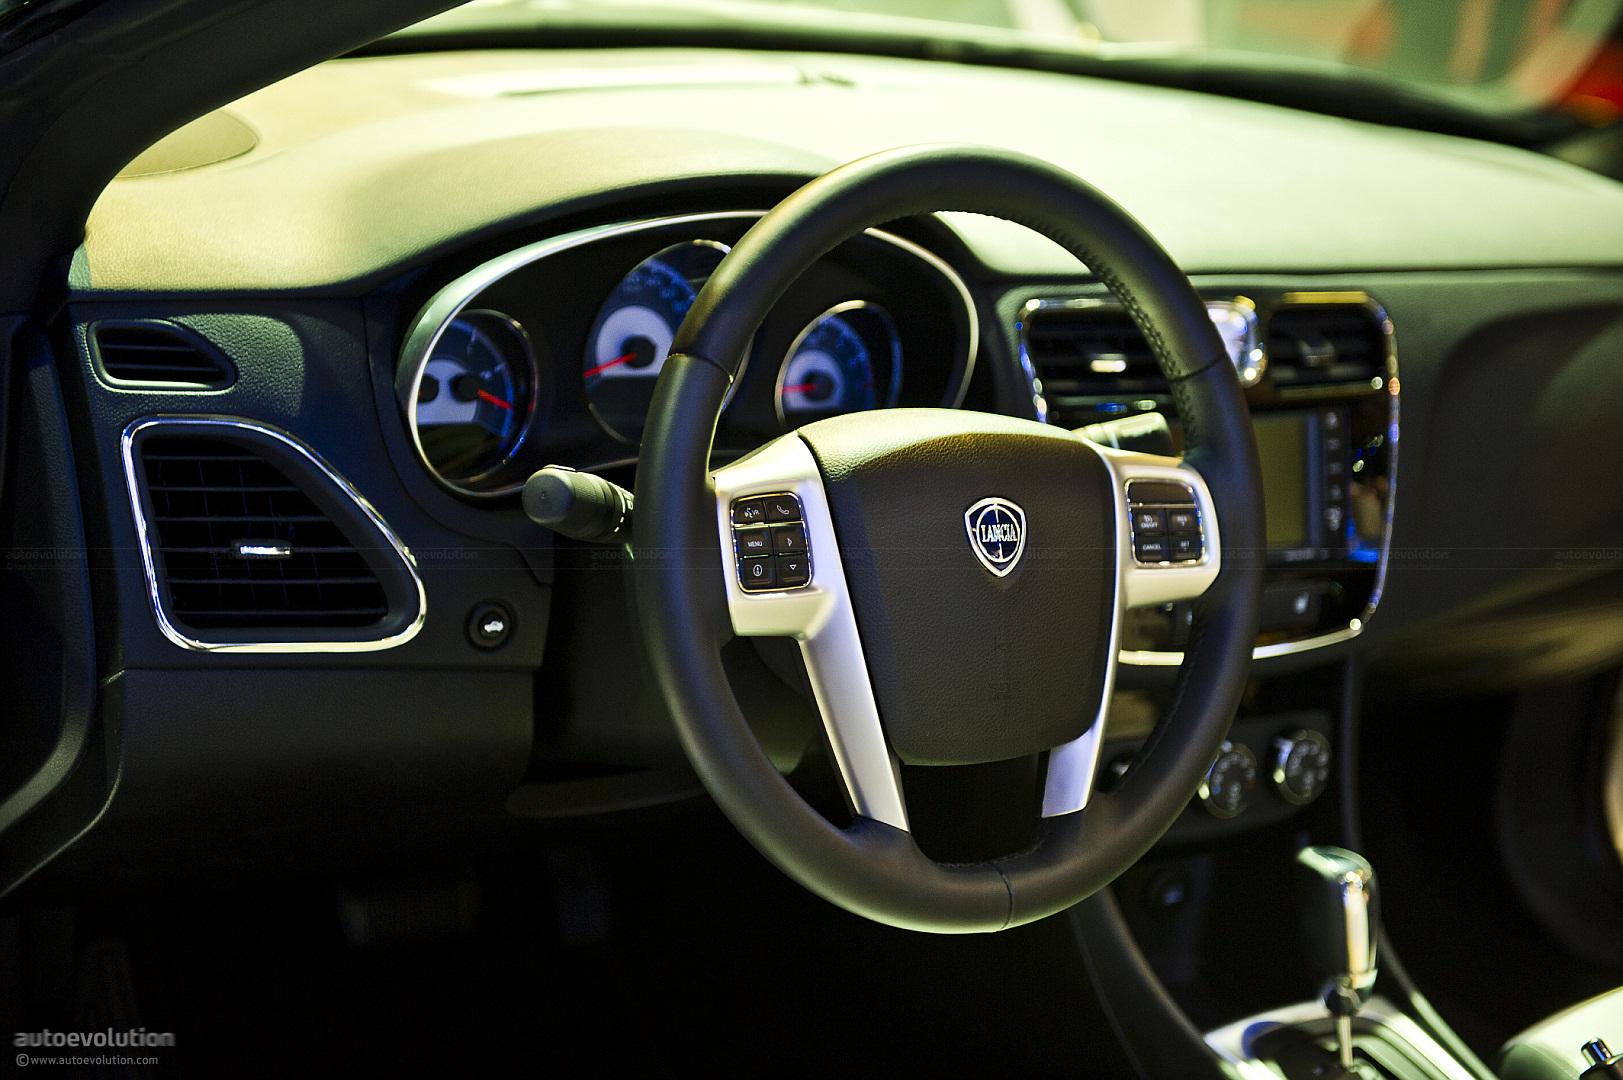 https://s1.cdn.autoevolution.com/images/news/gallery/production-lancia-flavia-cabrio-to-debut-in-geneva_10.jpg